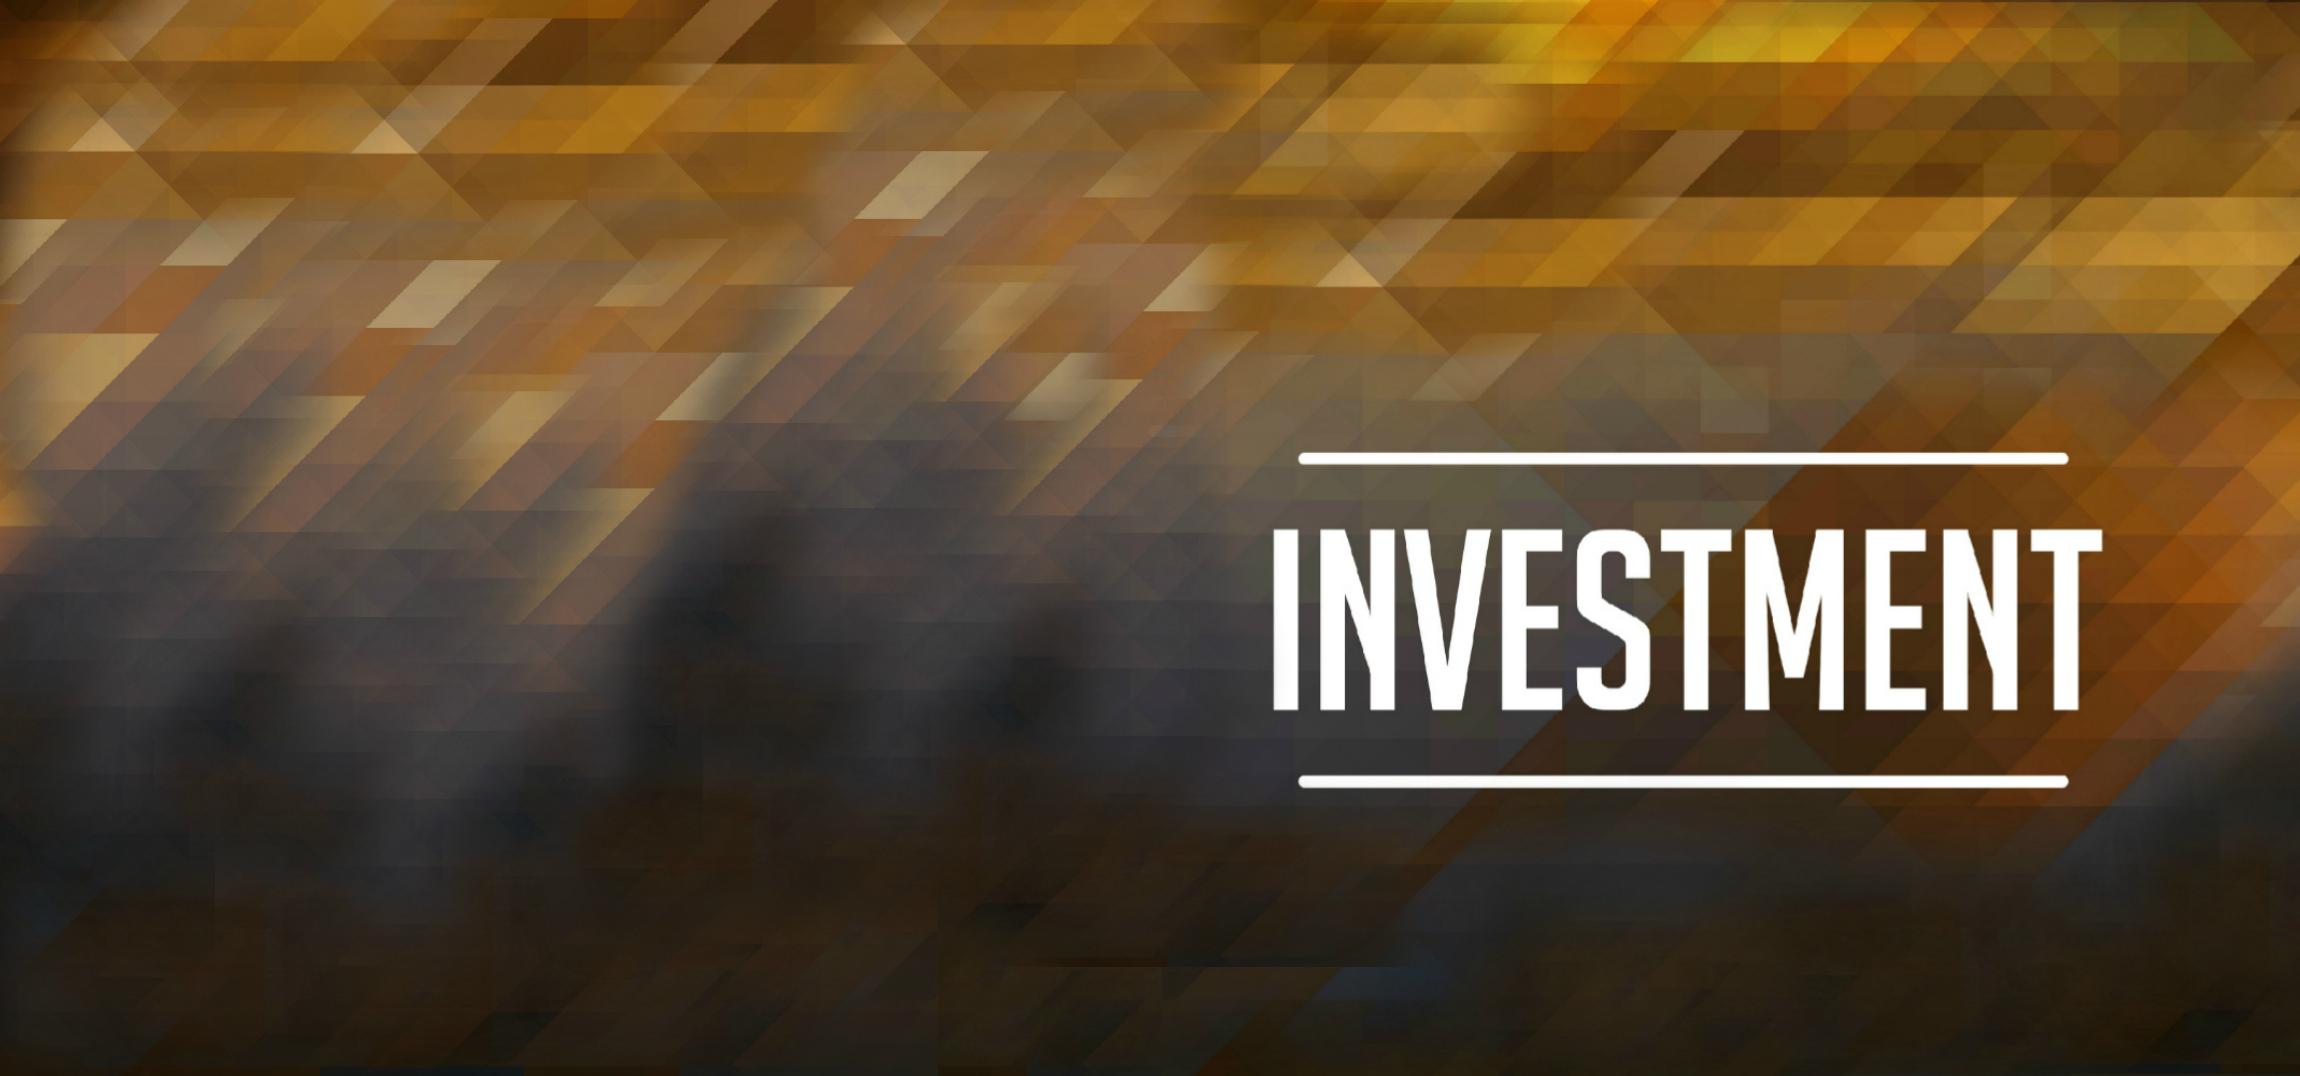 investemnt-new